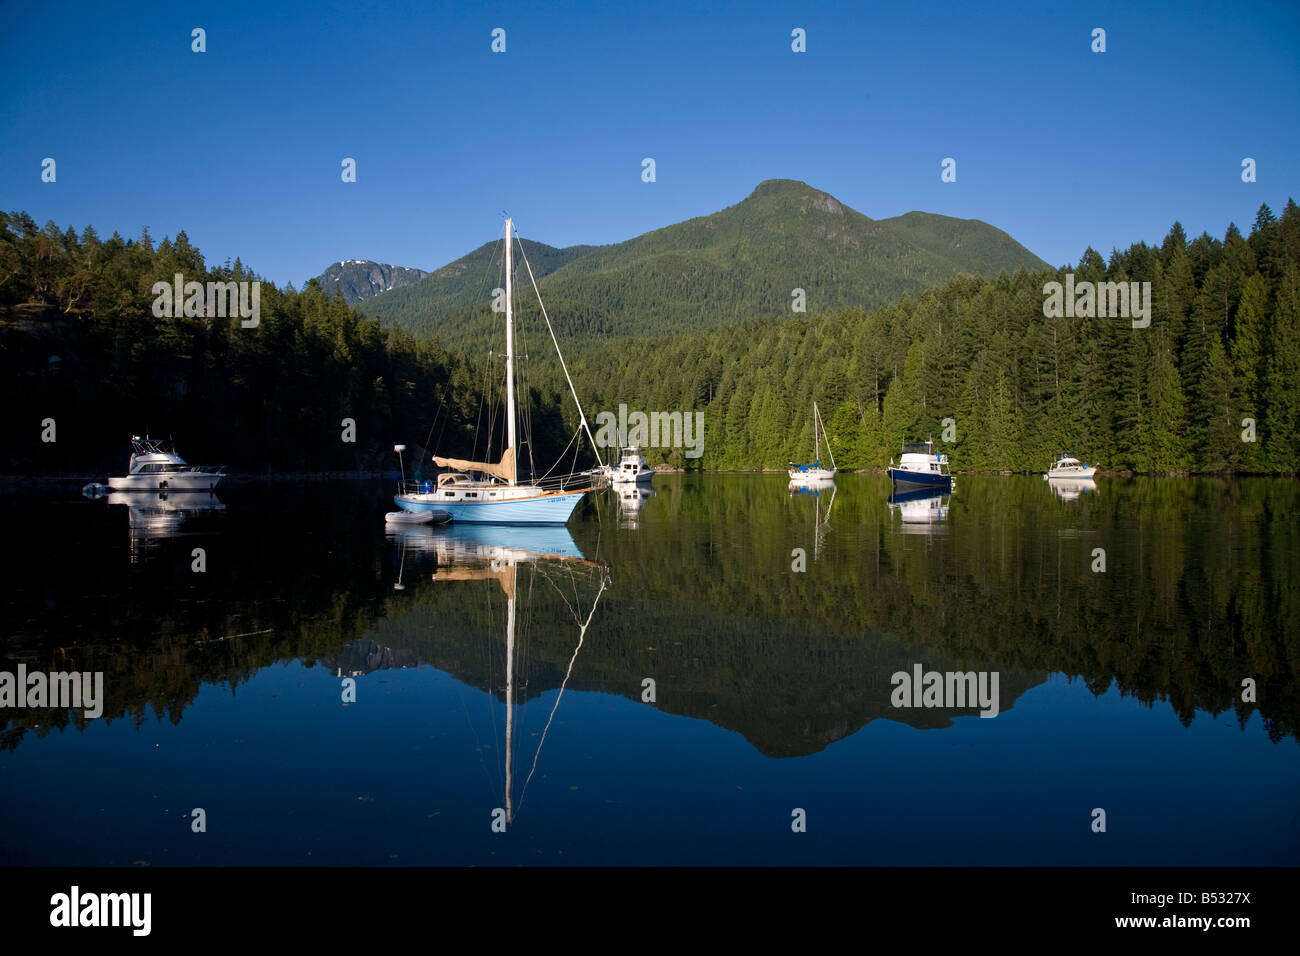 Melanie Cove Desolation Sound British Columbia Canada - Stock Image